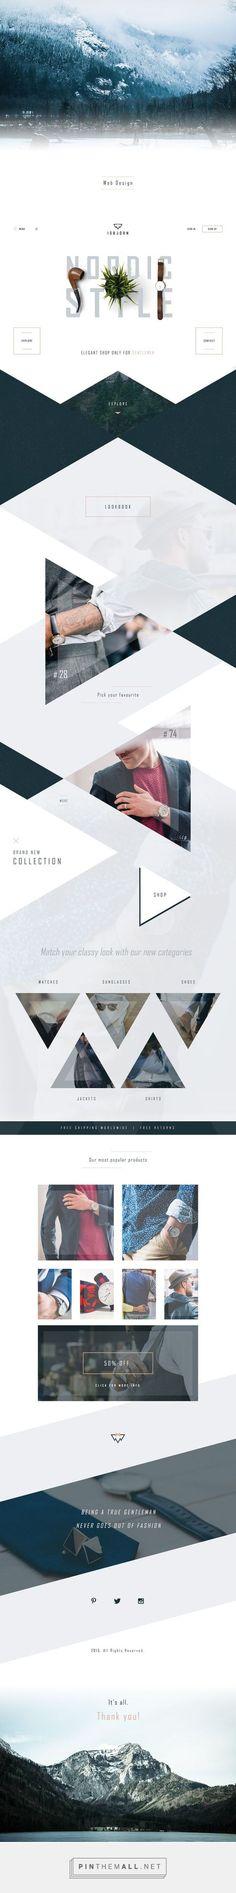 Fashion Web Design   Fivestar Branding – Design and Branding Agency & Inspiration Gallery